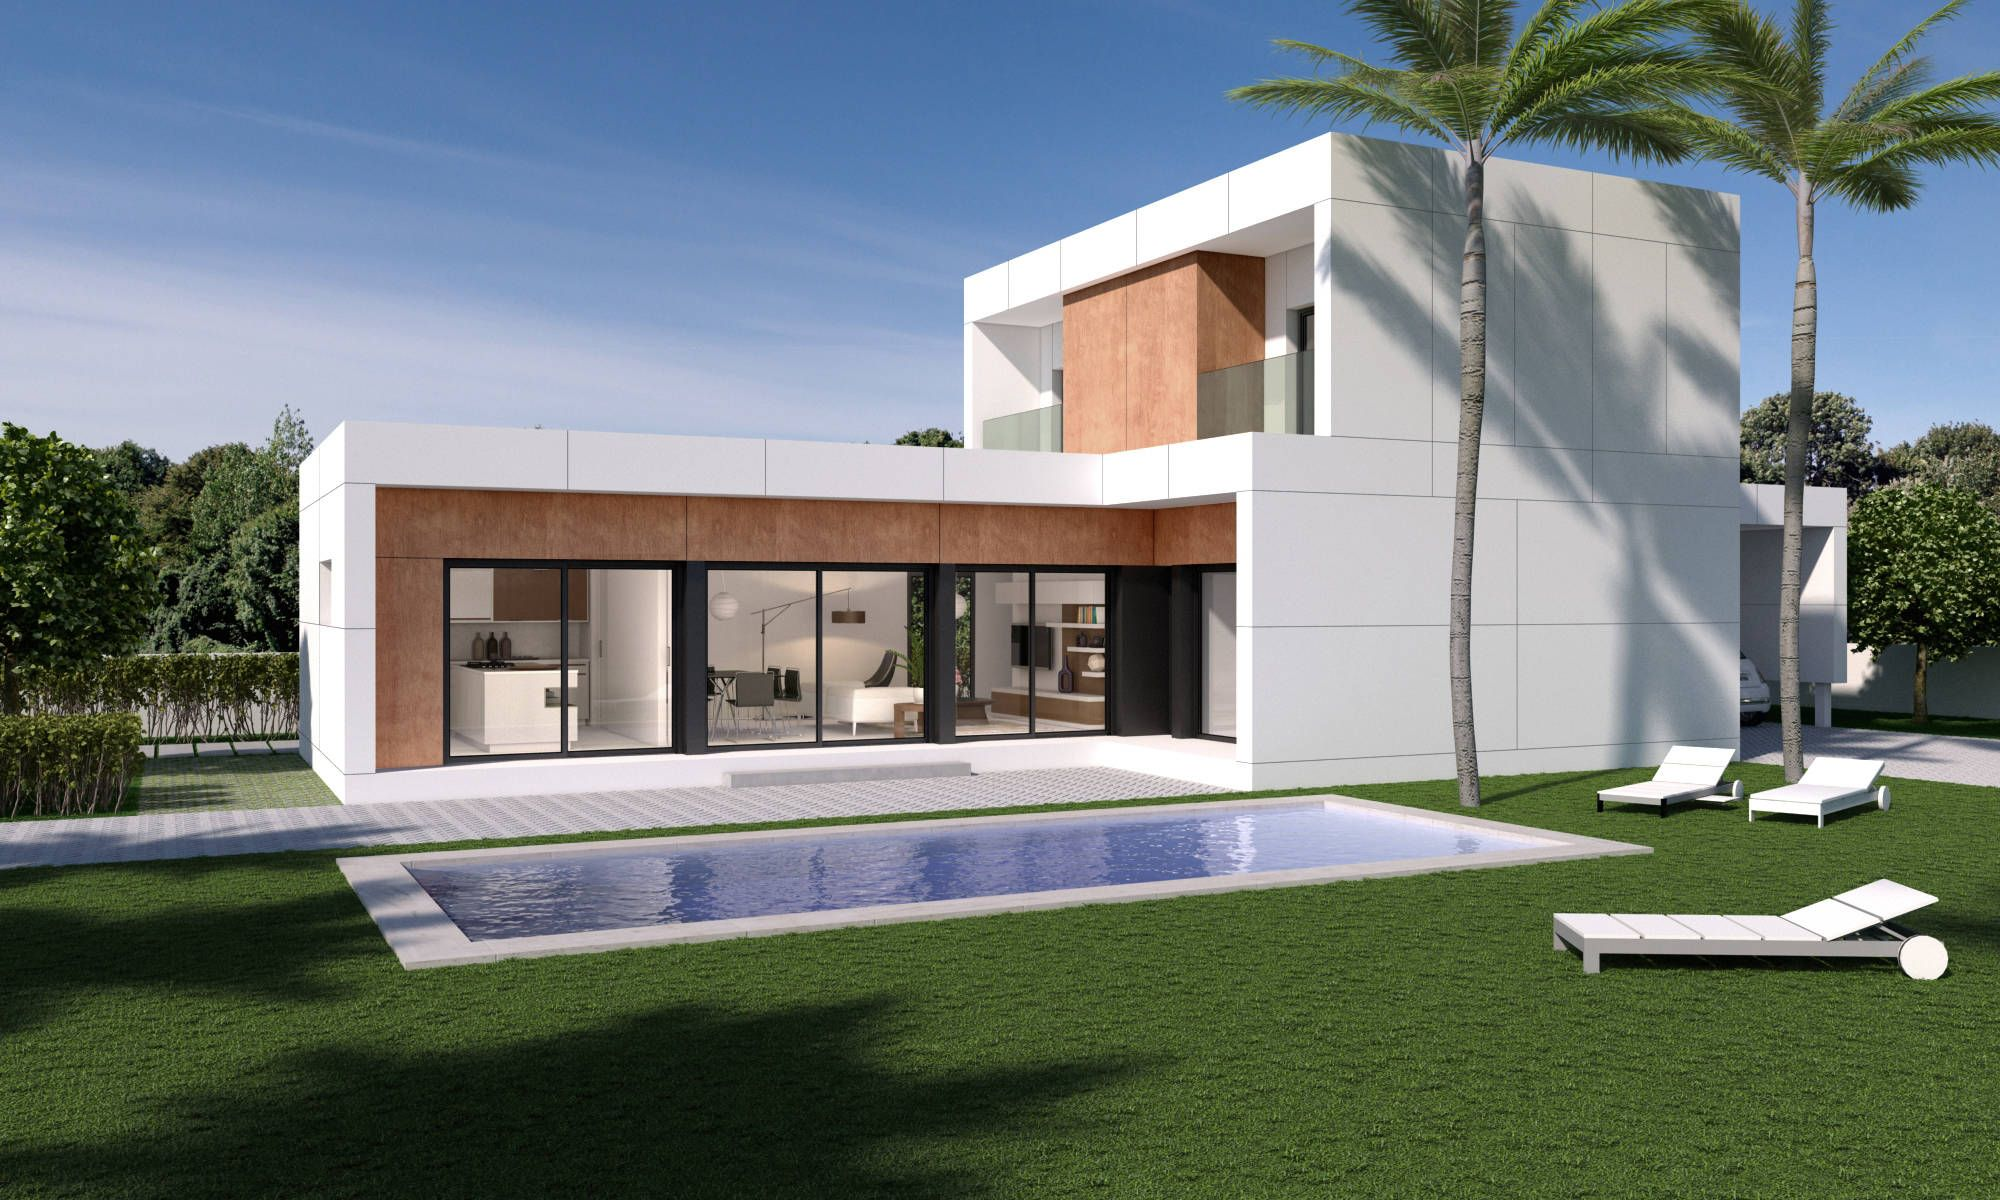 Vivienda modular 206 m2 de nuño arquitectura moderno